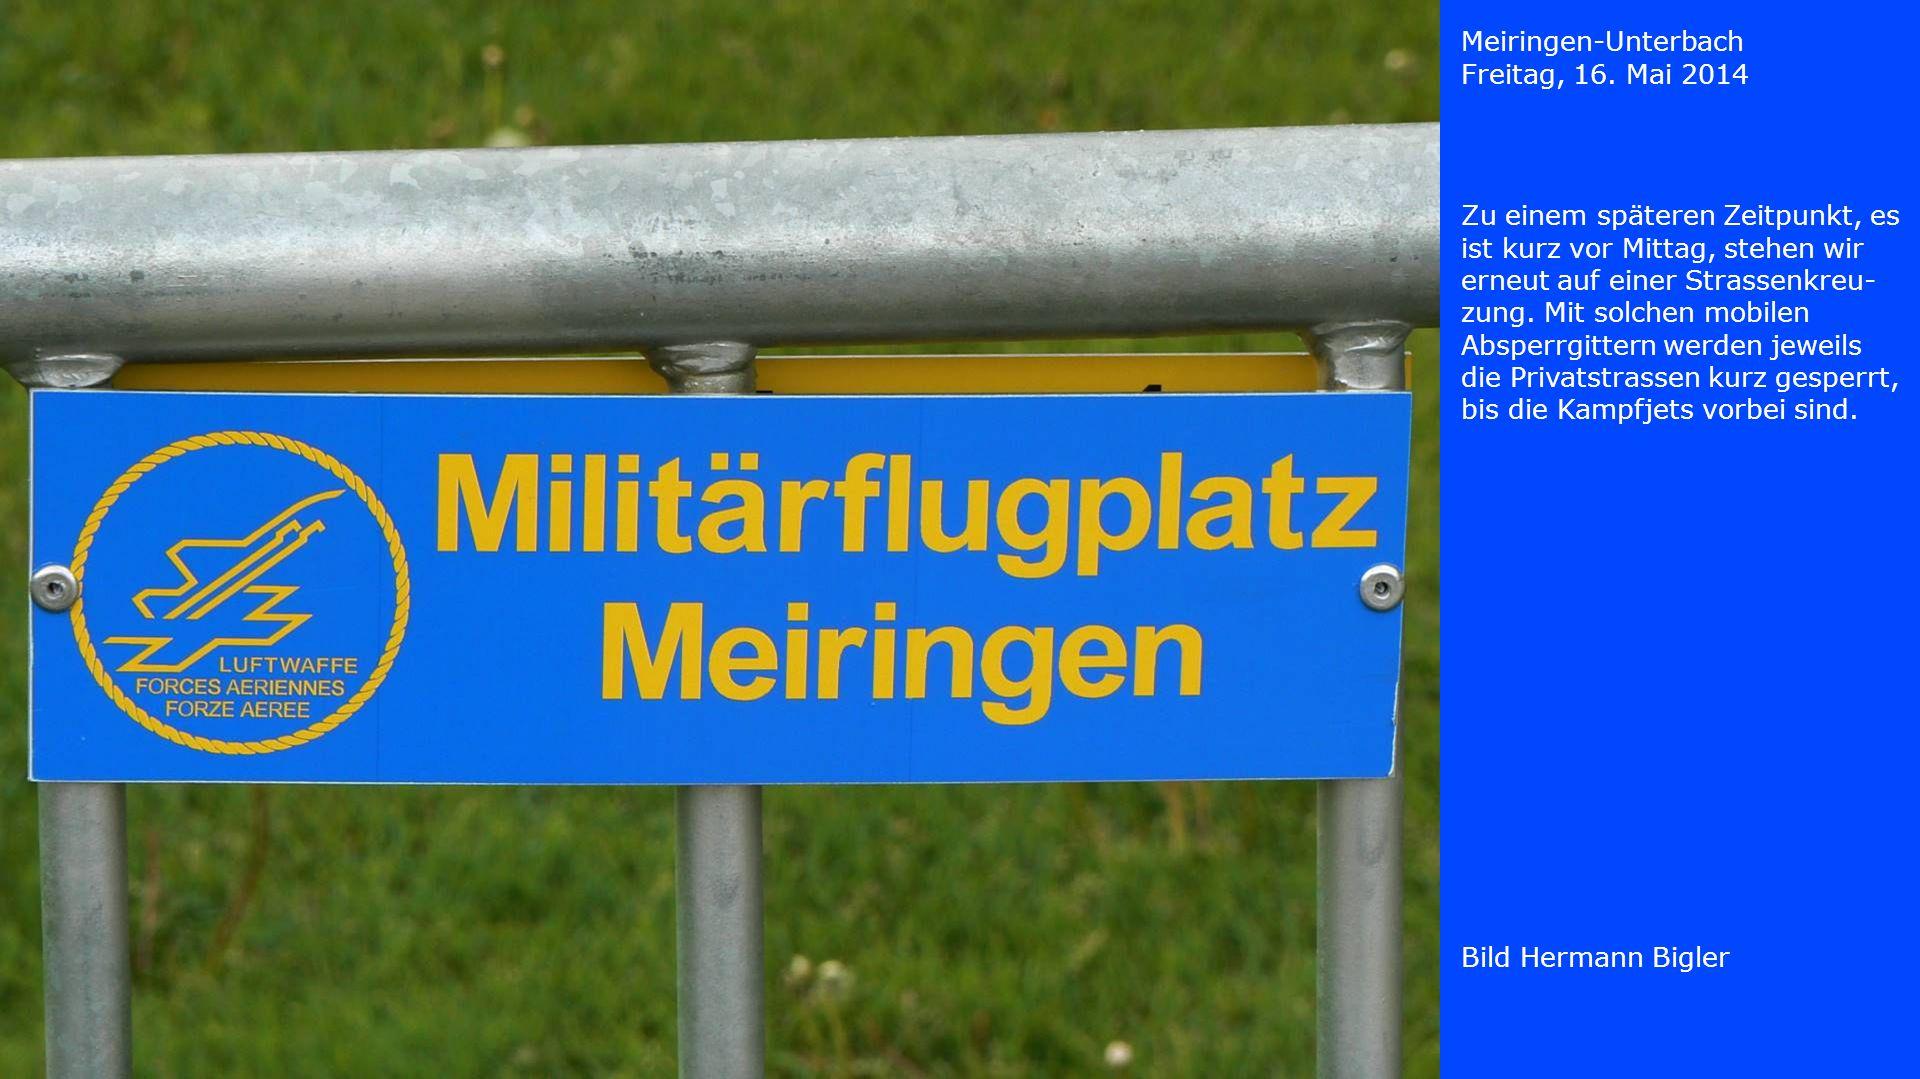 Meiringen-Unterbach Freitag, 16. Mai 2014.